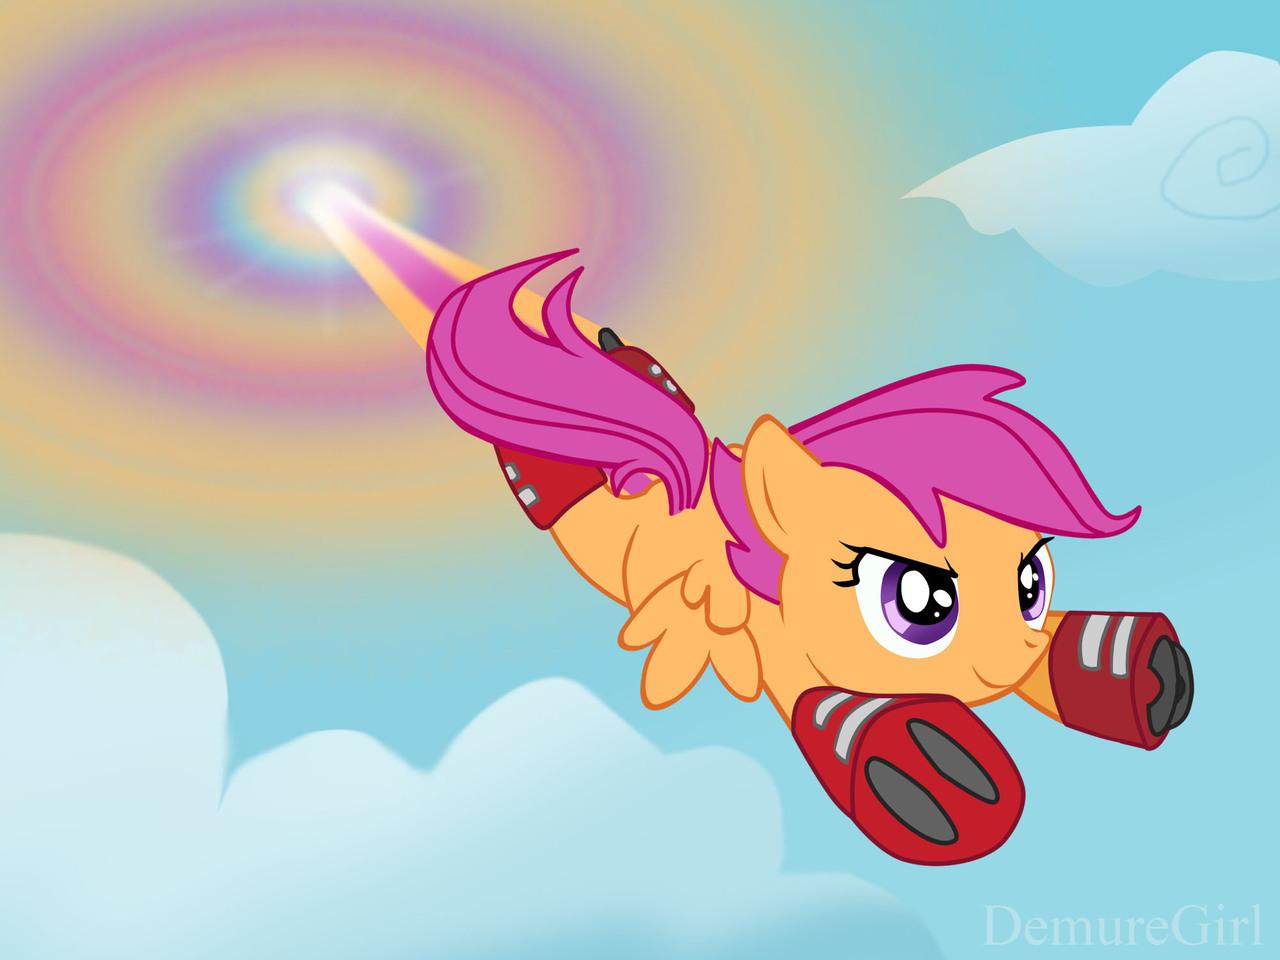 142815 Artist Demuregirl Safe Scootaloo Scootaloo Can Fly Solo Sonic Rainboom Sonic Scootaboom Sonic Xboom Derpibooru Rainbow dash taught scootaloo everything she needed to live her. 142815 artist demuregirl safe